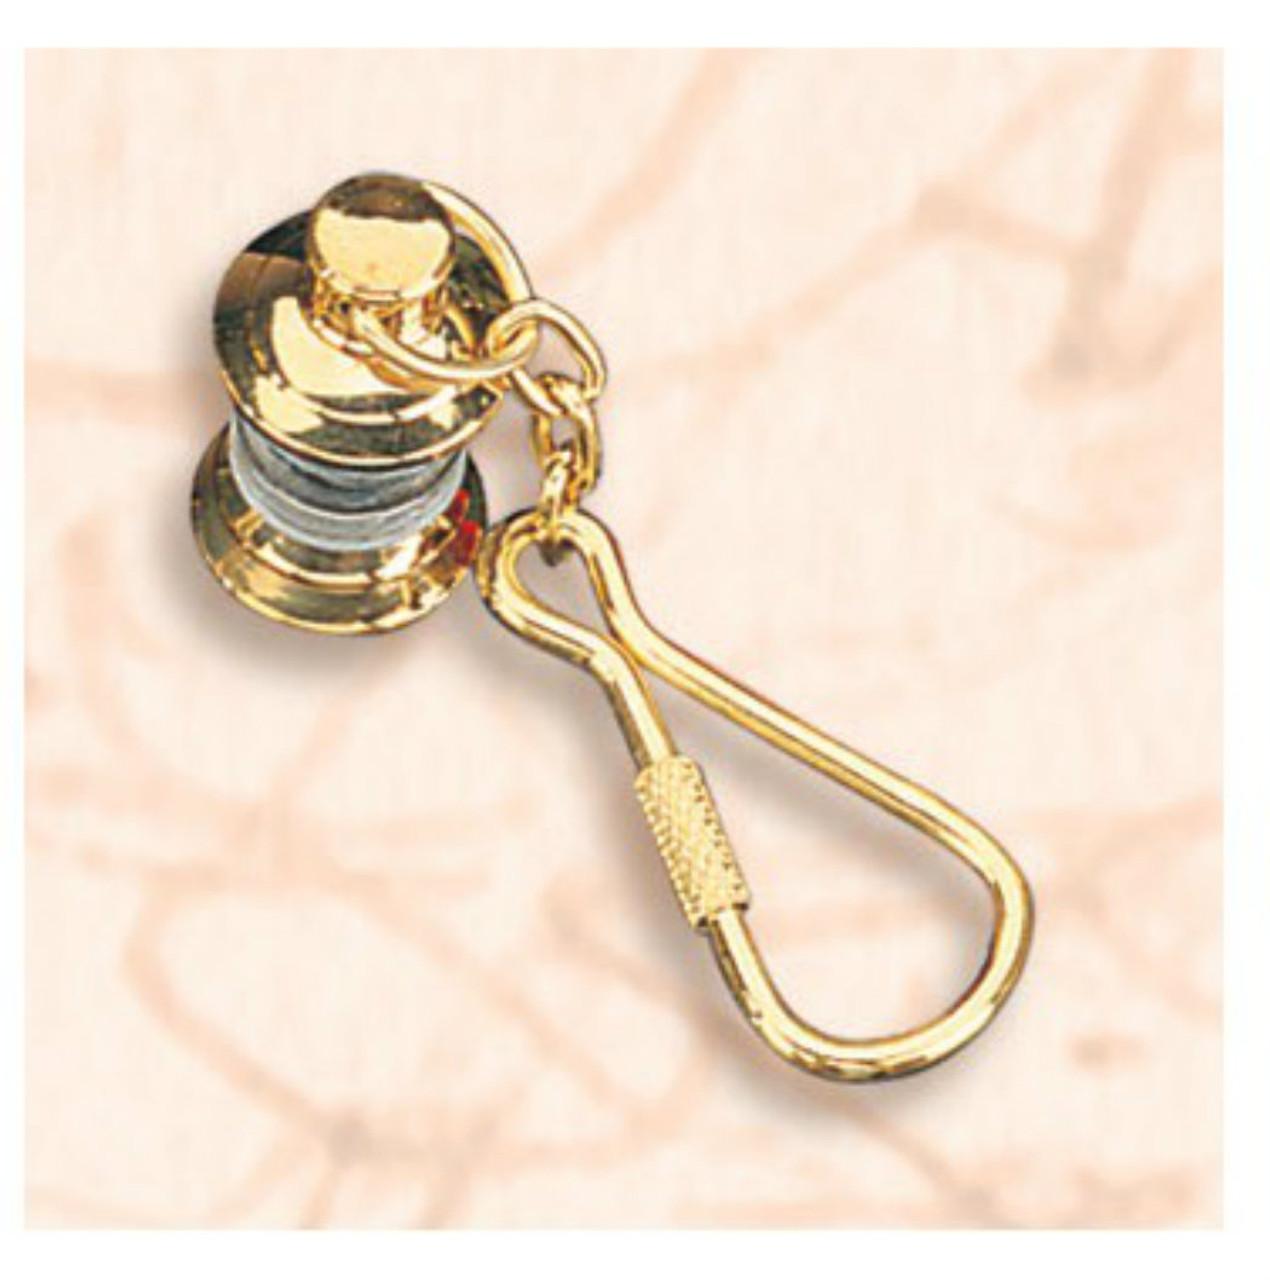 Brass Key Chain - Lantern